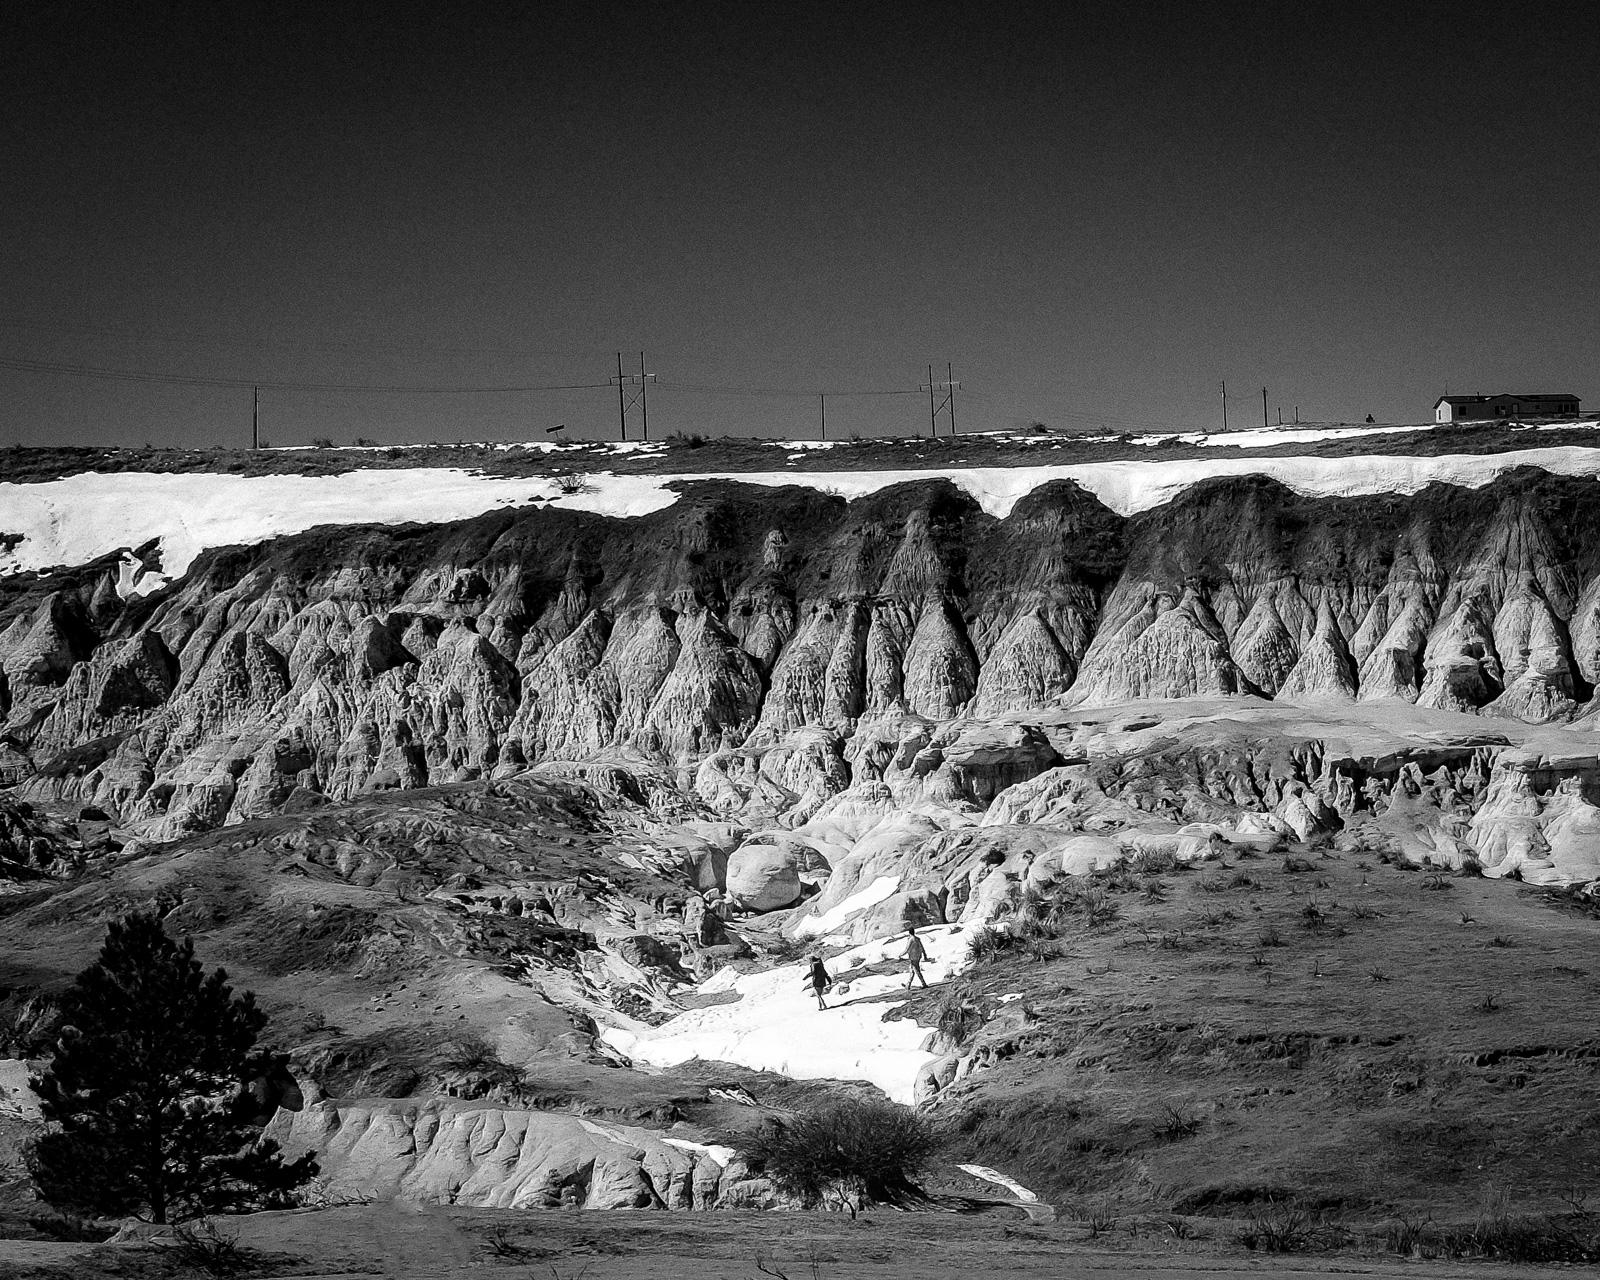 Day 86- 365 Day B&W Photo Challenge - The Paint Mines Interpretive Park outside of Calhan, Colorado in El Paso County- Fuji X100F, VSCO Tri-X 400 Film Simulation